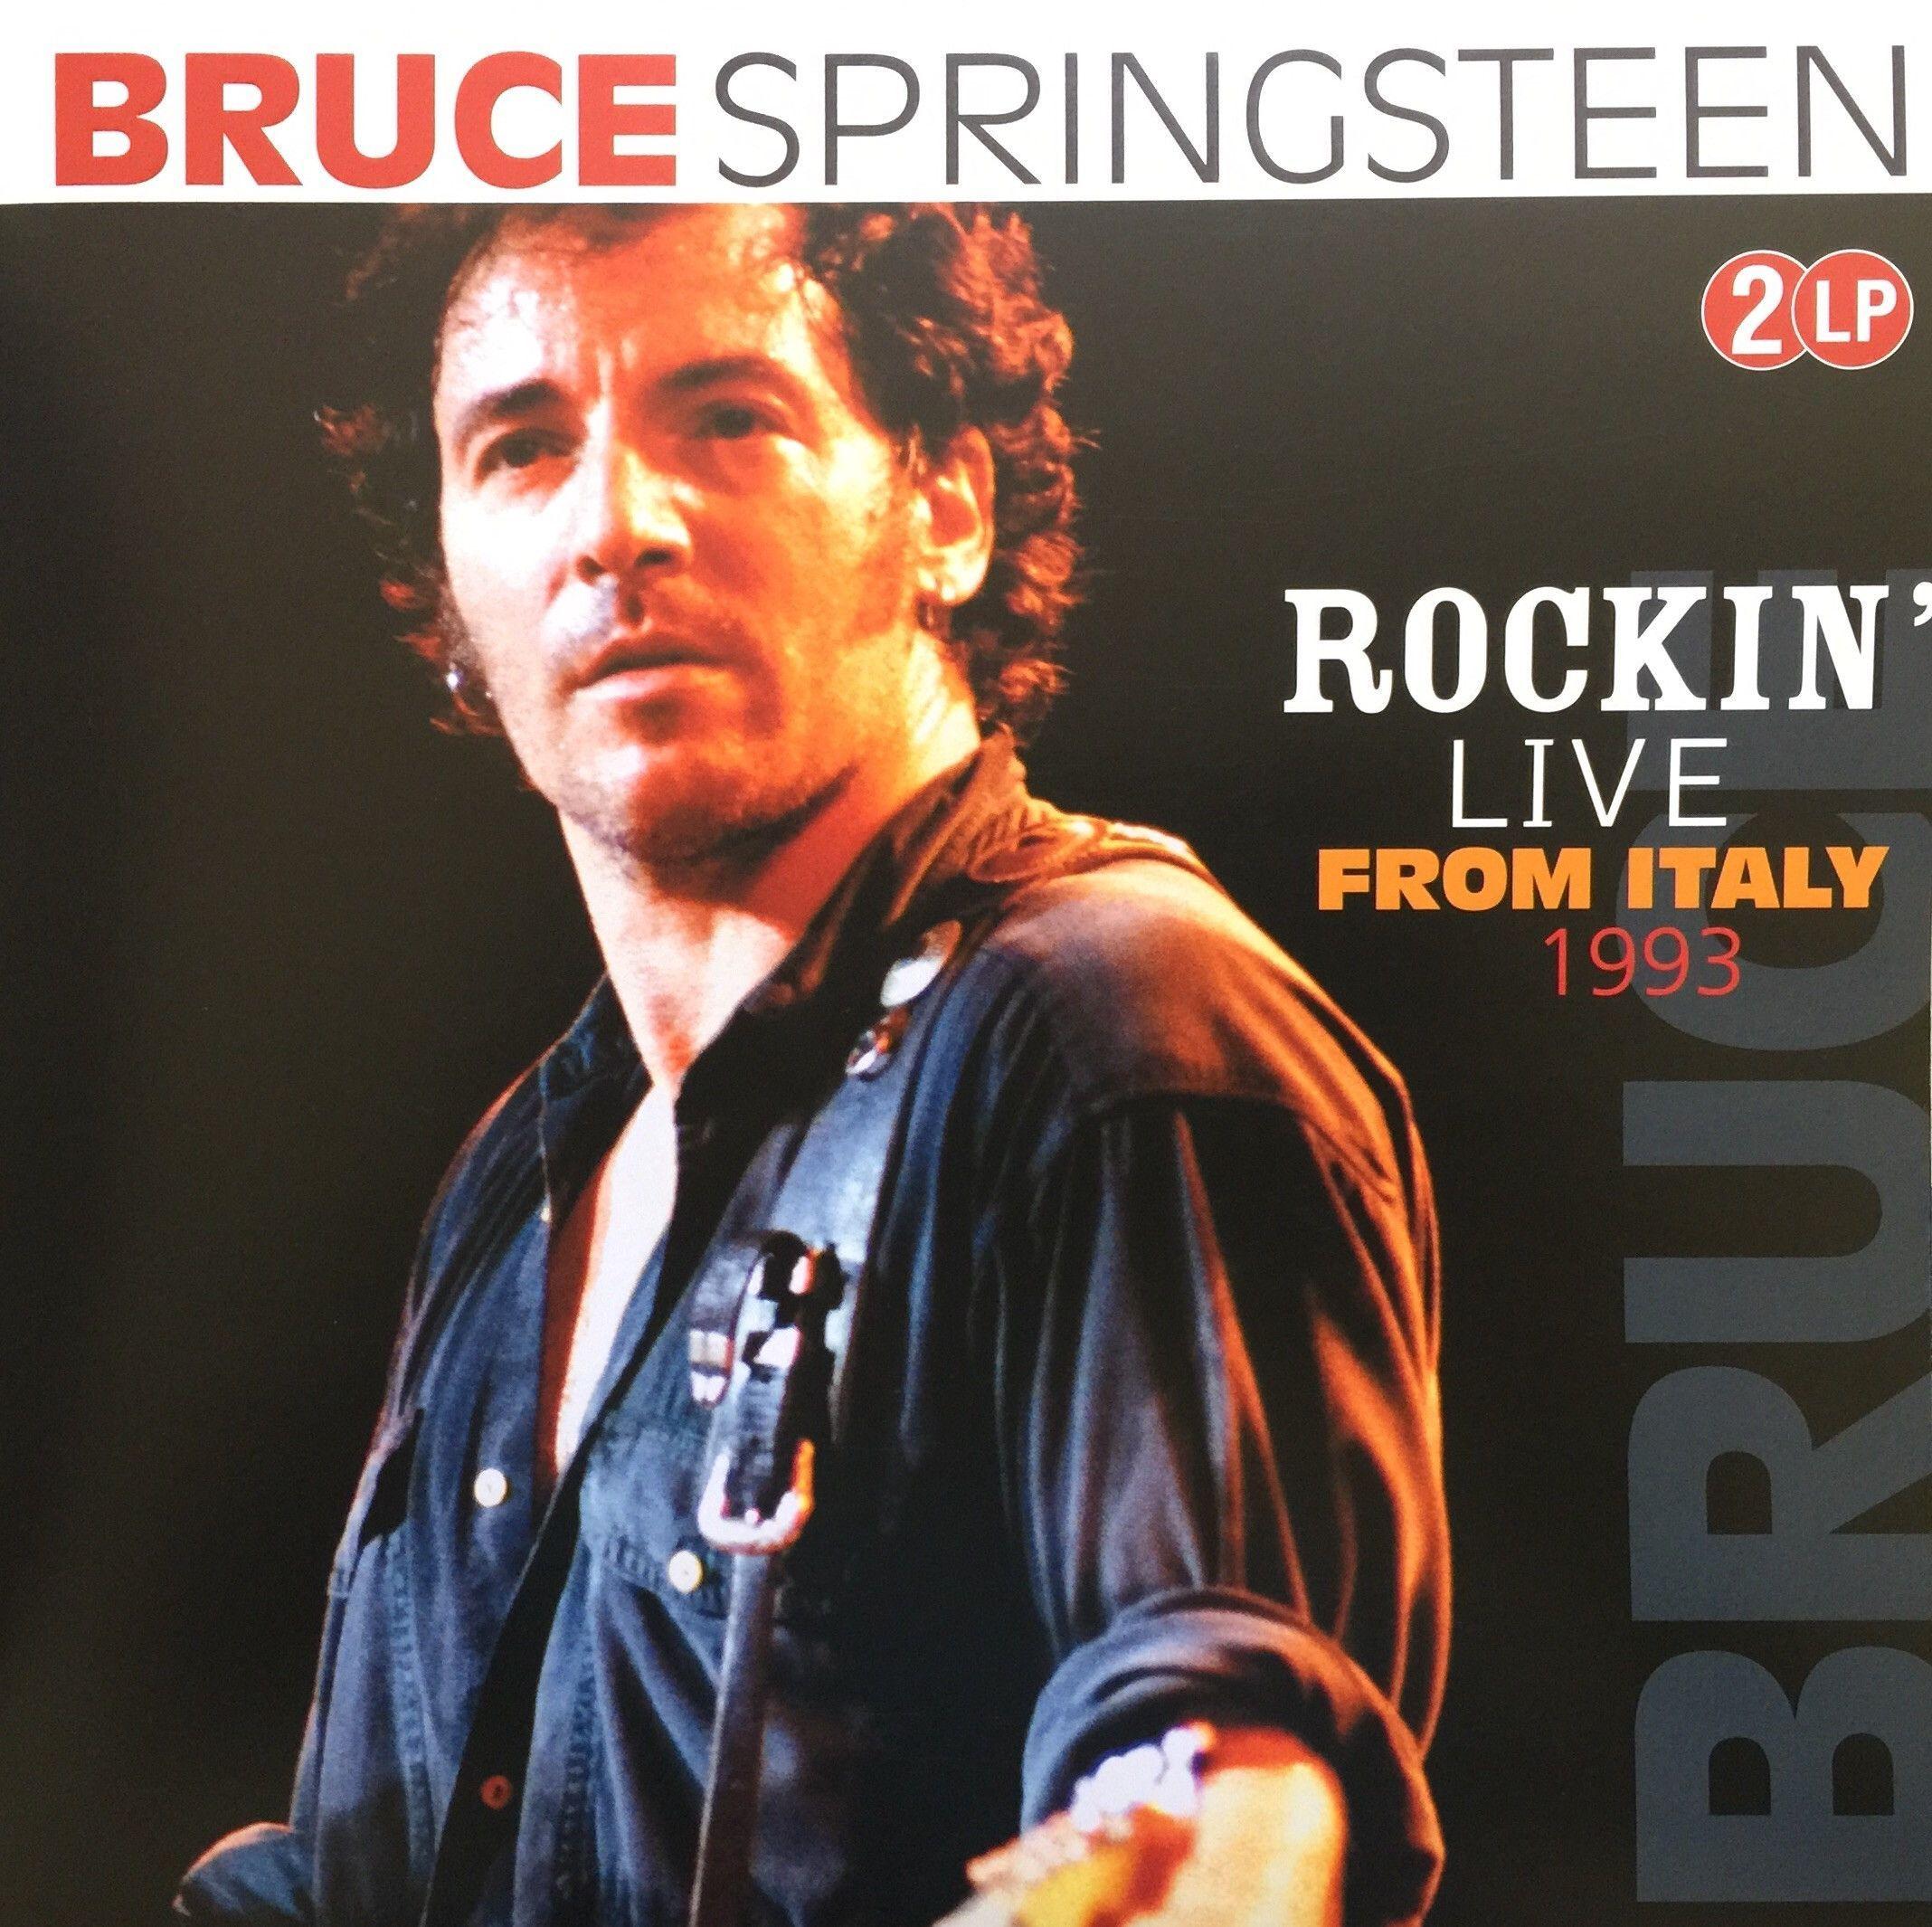 Bruce Springsteen Rockin Live From Italy 1993 Vinyl Lp Double Record Album Bruce Springsteen Bruce Springsteen The Boss Record Album